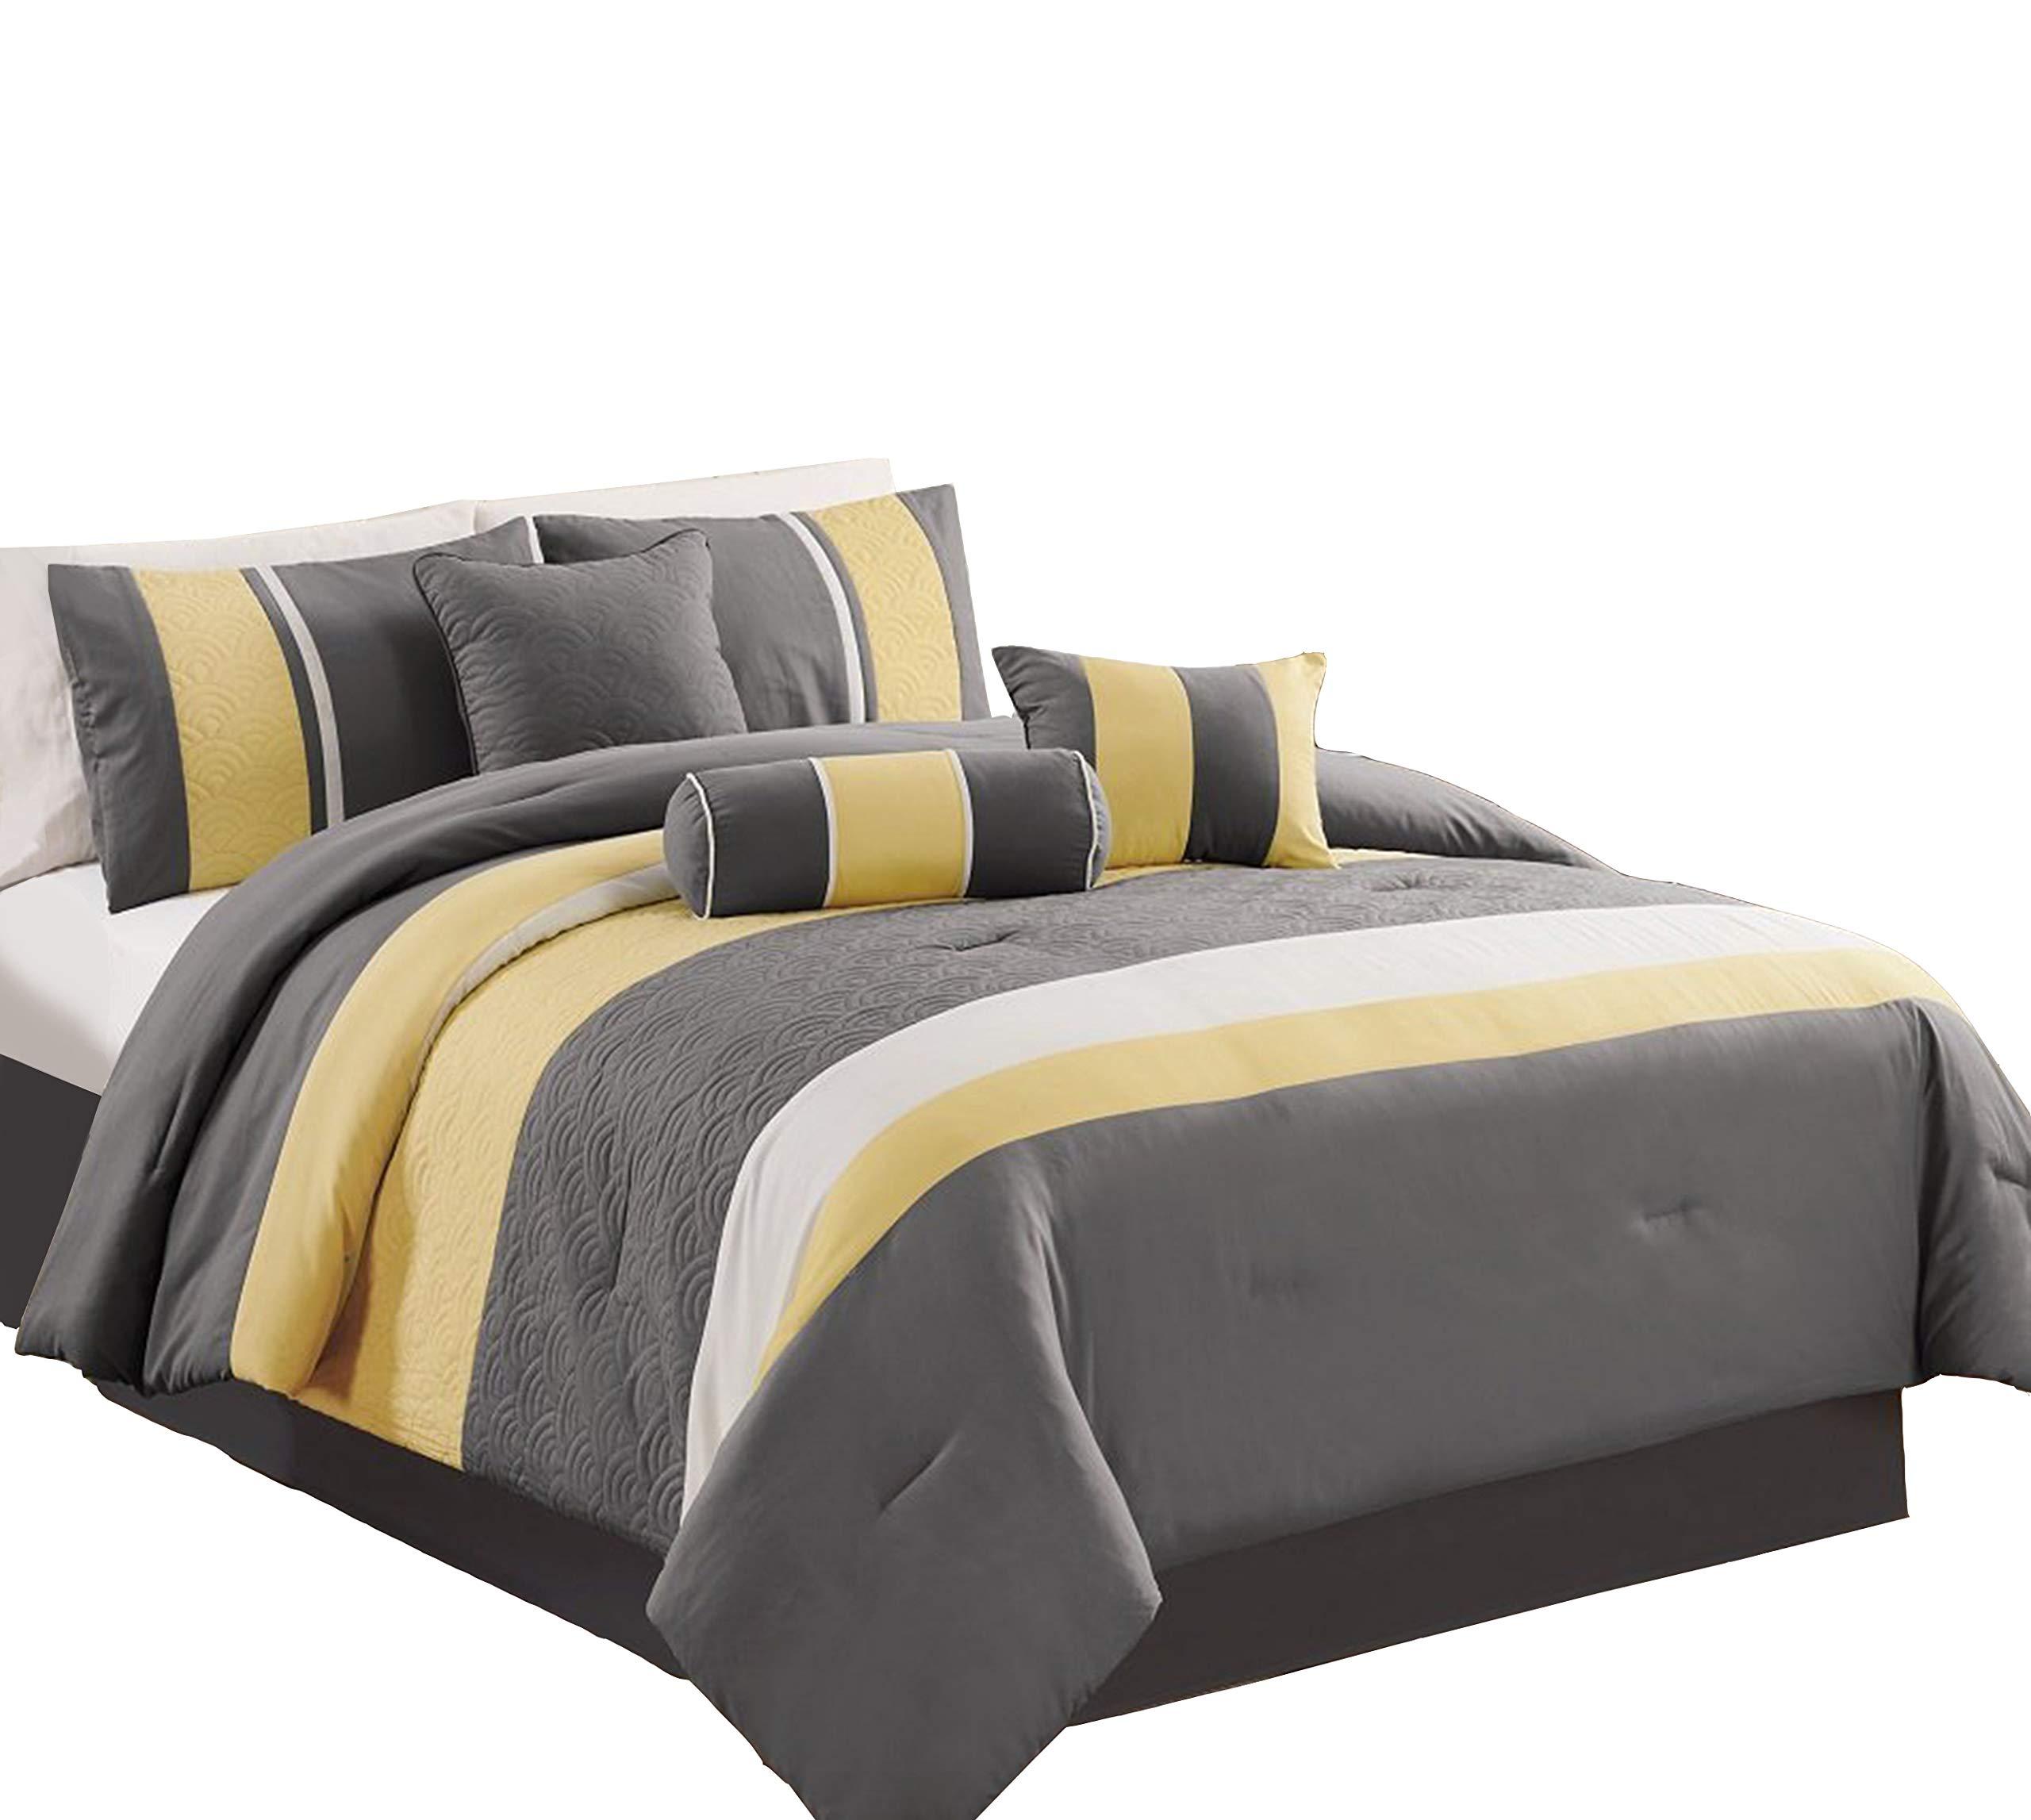 "Chezmoi Collection 7-Piece Sunvale Yellow Grey White Comforter Bedding Set (Queen) - 1 Comforter 90""x92"", 2 Shams 20""x26"" 1 Bed Skirt 60""x80""+14"" , 1 Cushions 18""x18"" 1 Neckroll 8""x18"", 1 Breakfast Pillow 12""x18"" - comforter-sets, bedroom-sheets-comforters, bedroom - 711rQ1WOhQL -"